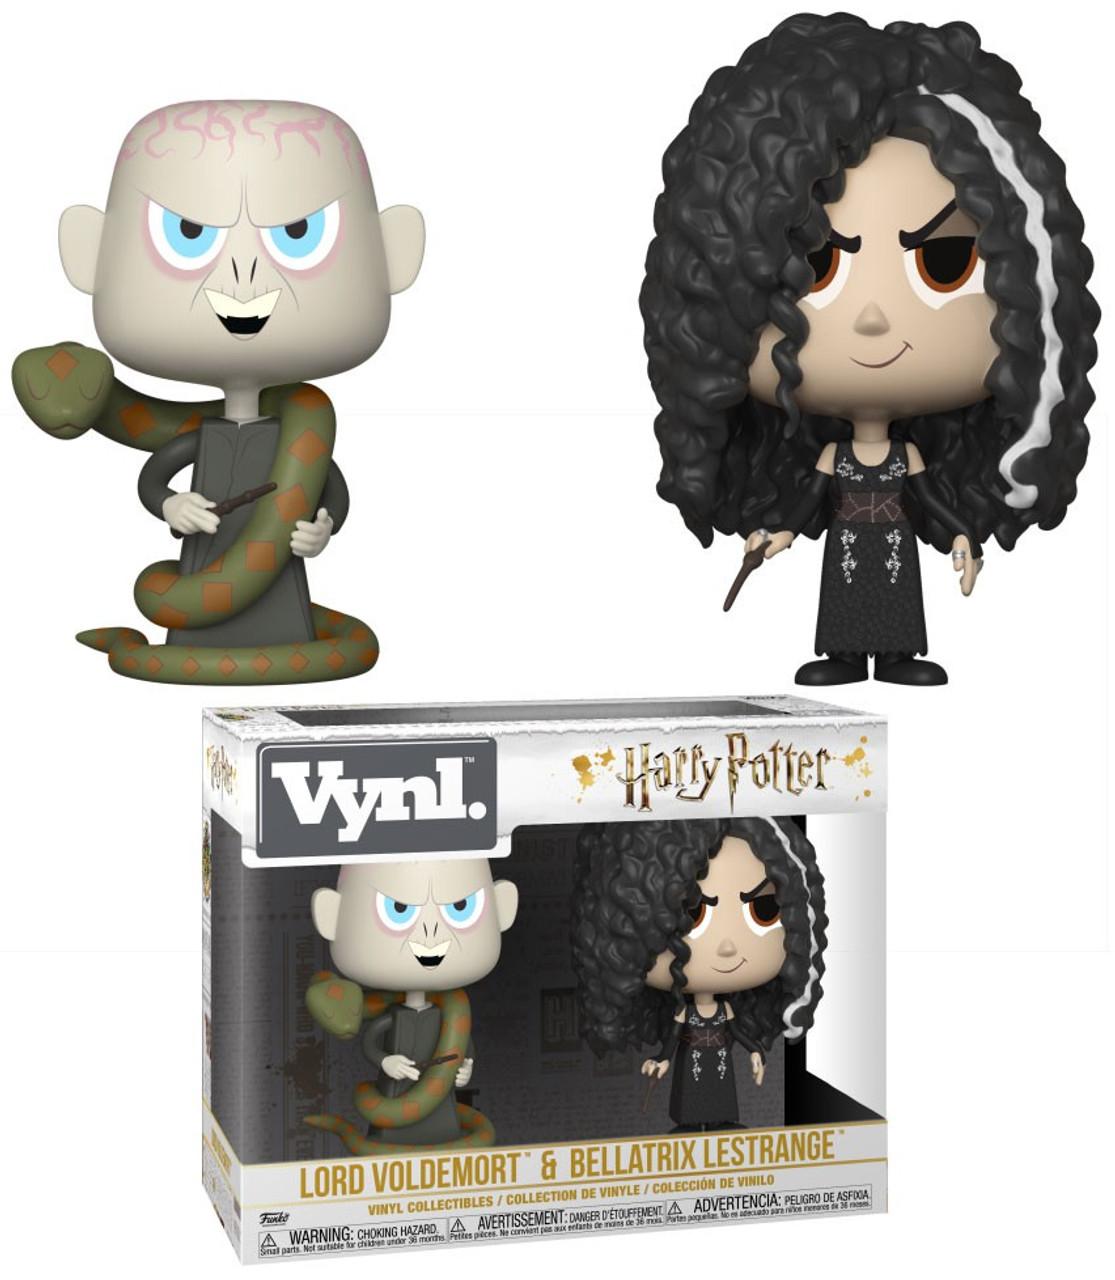 c7b227d7b4c Funko Harry Potter Vynl. Lord Voldemort Bellatrix Lestrange Vinyl Figure  2-Pack - ToyWiz